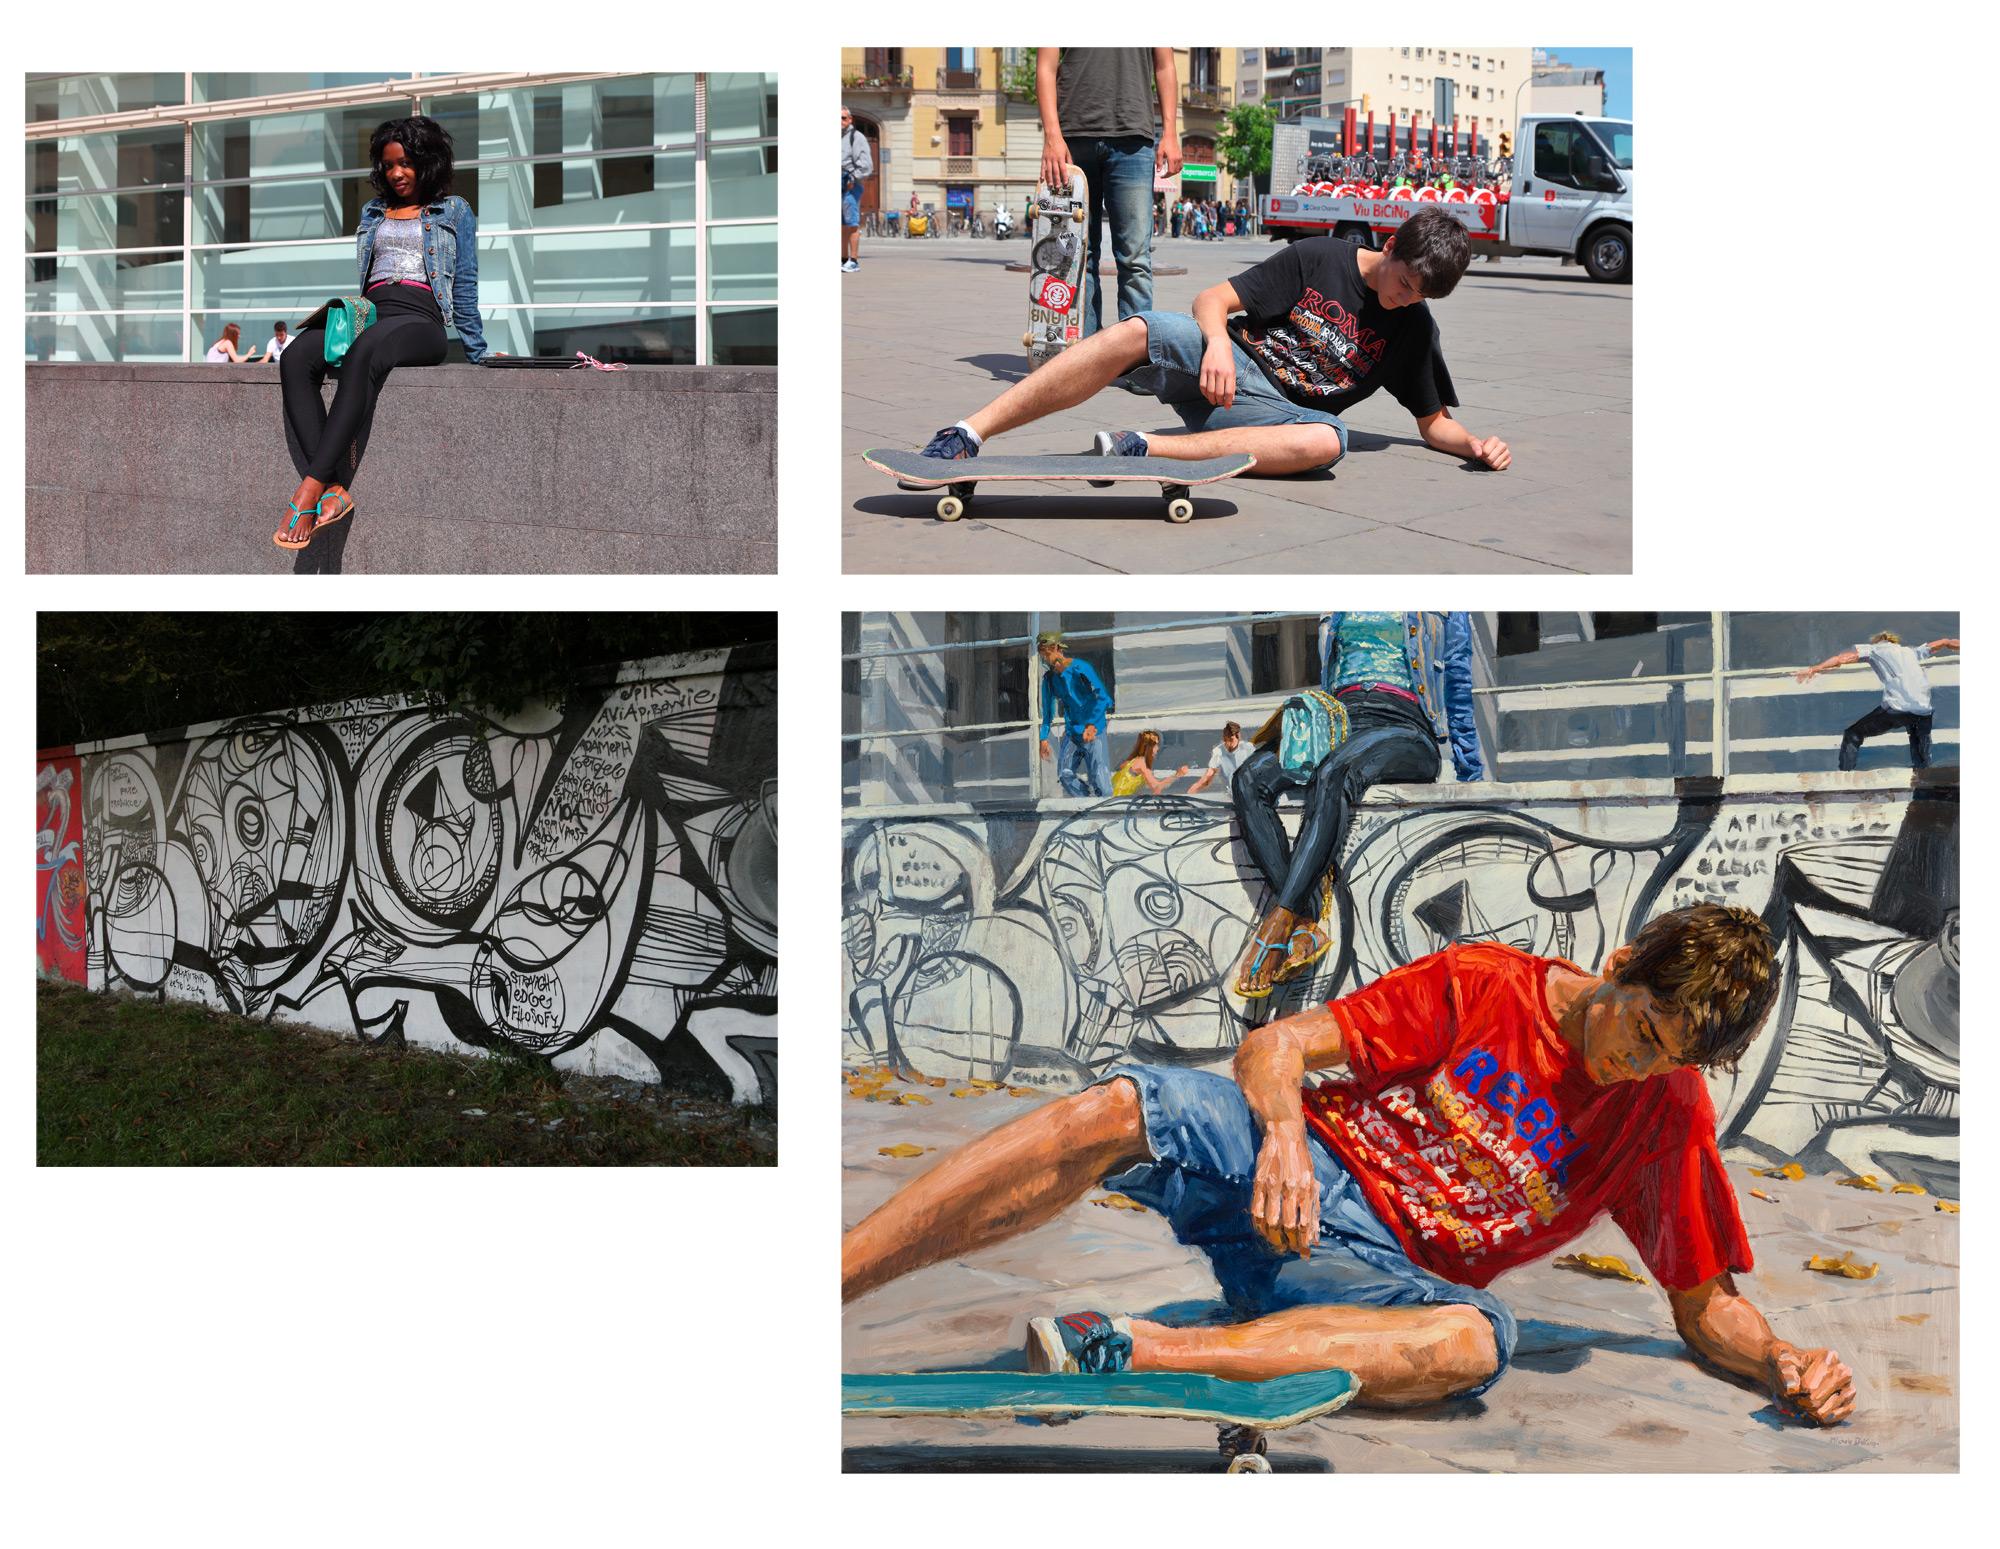 skater, process